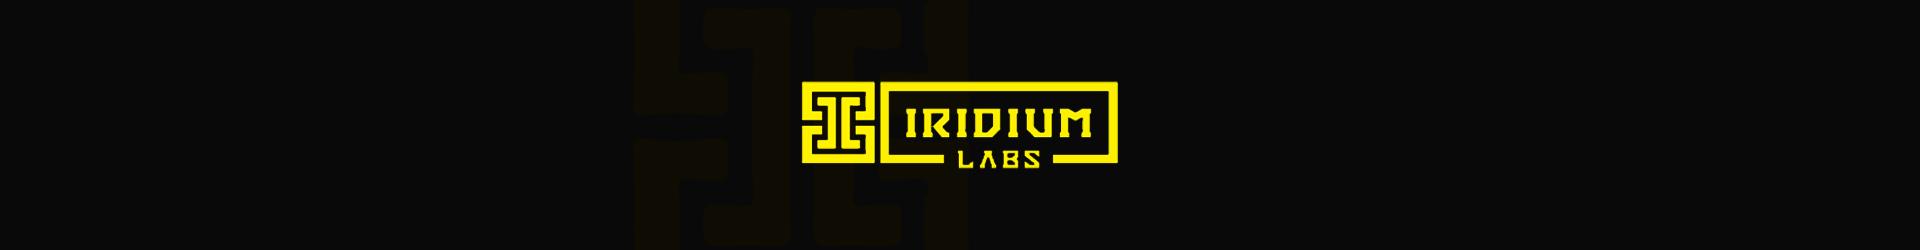 MARCA - Iridium Labs